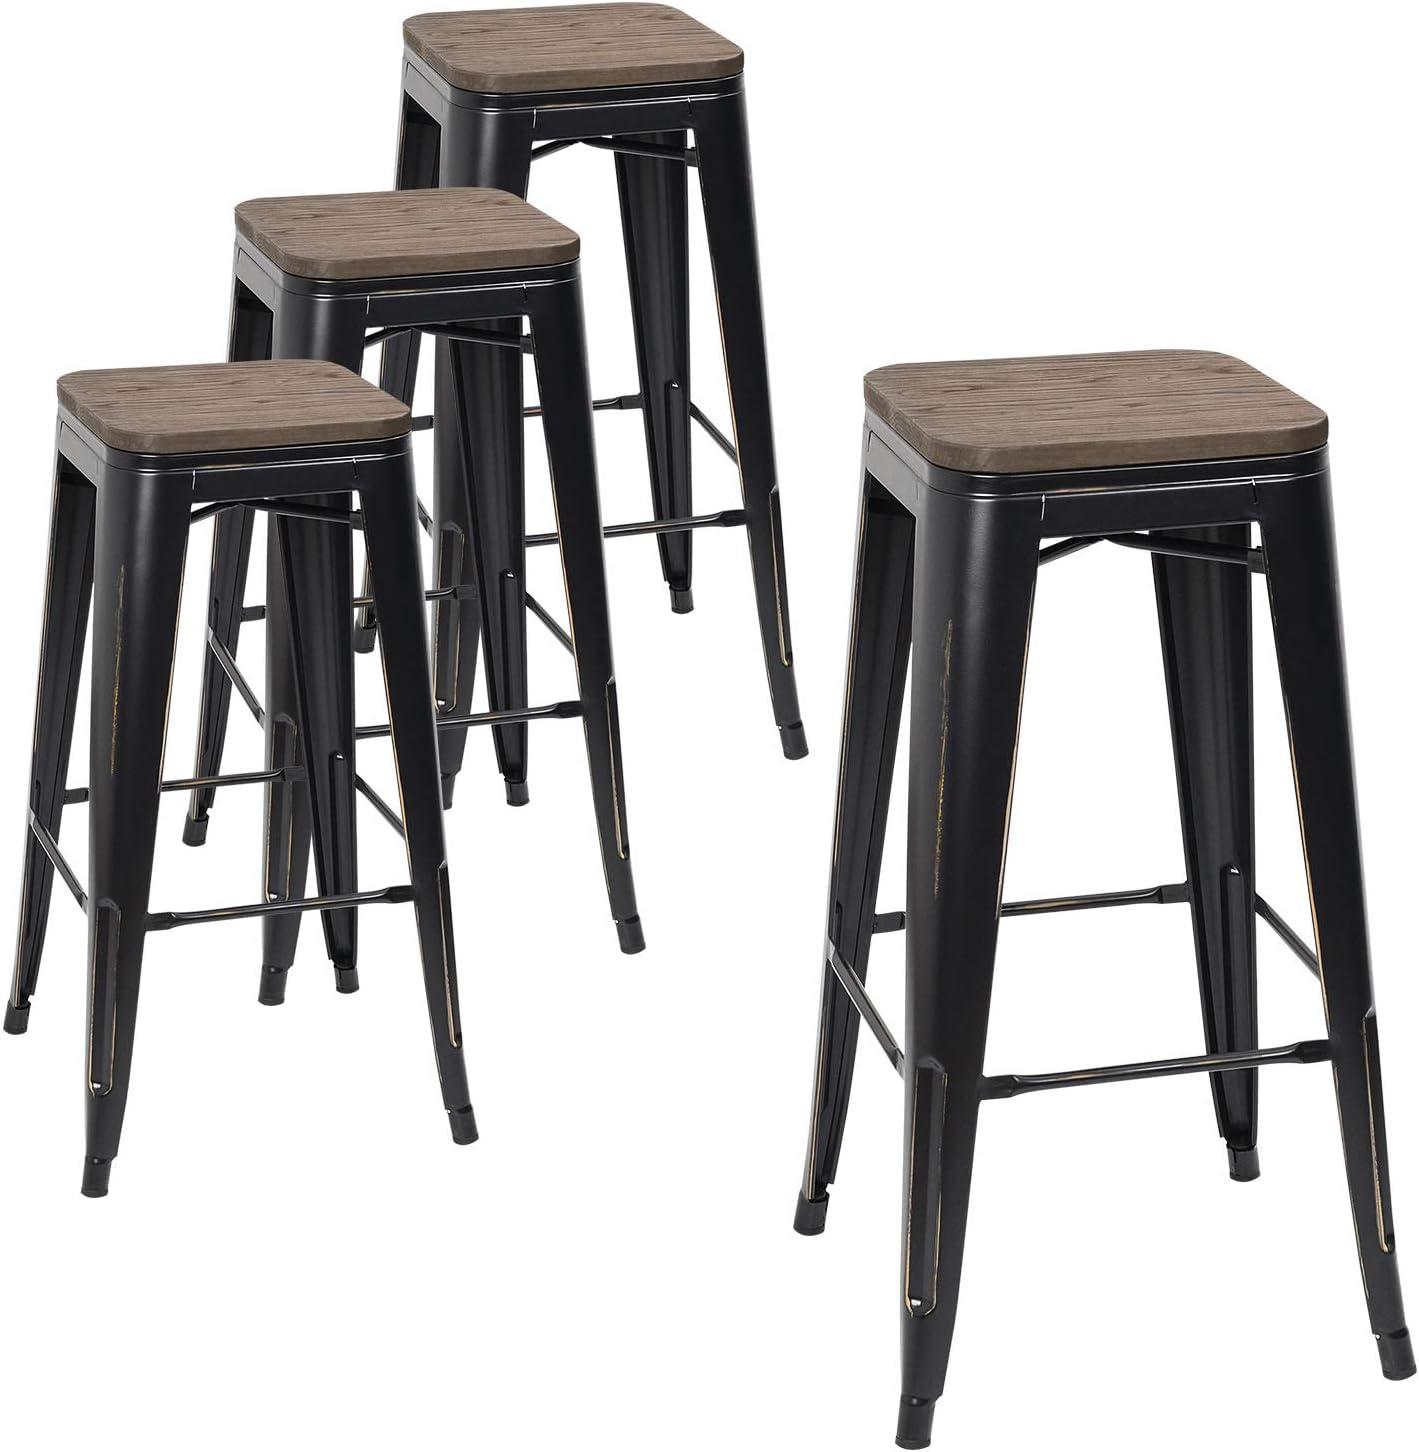 Devoko Metal Bar Stool 30 Indoor Outdoor Stackable Barstools Modern Industrial Square Wood Top Bar Stools Set Of 4 Black Gold Kitchen Dining